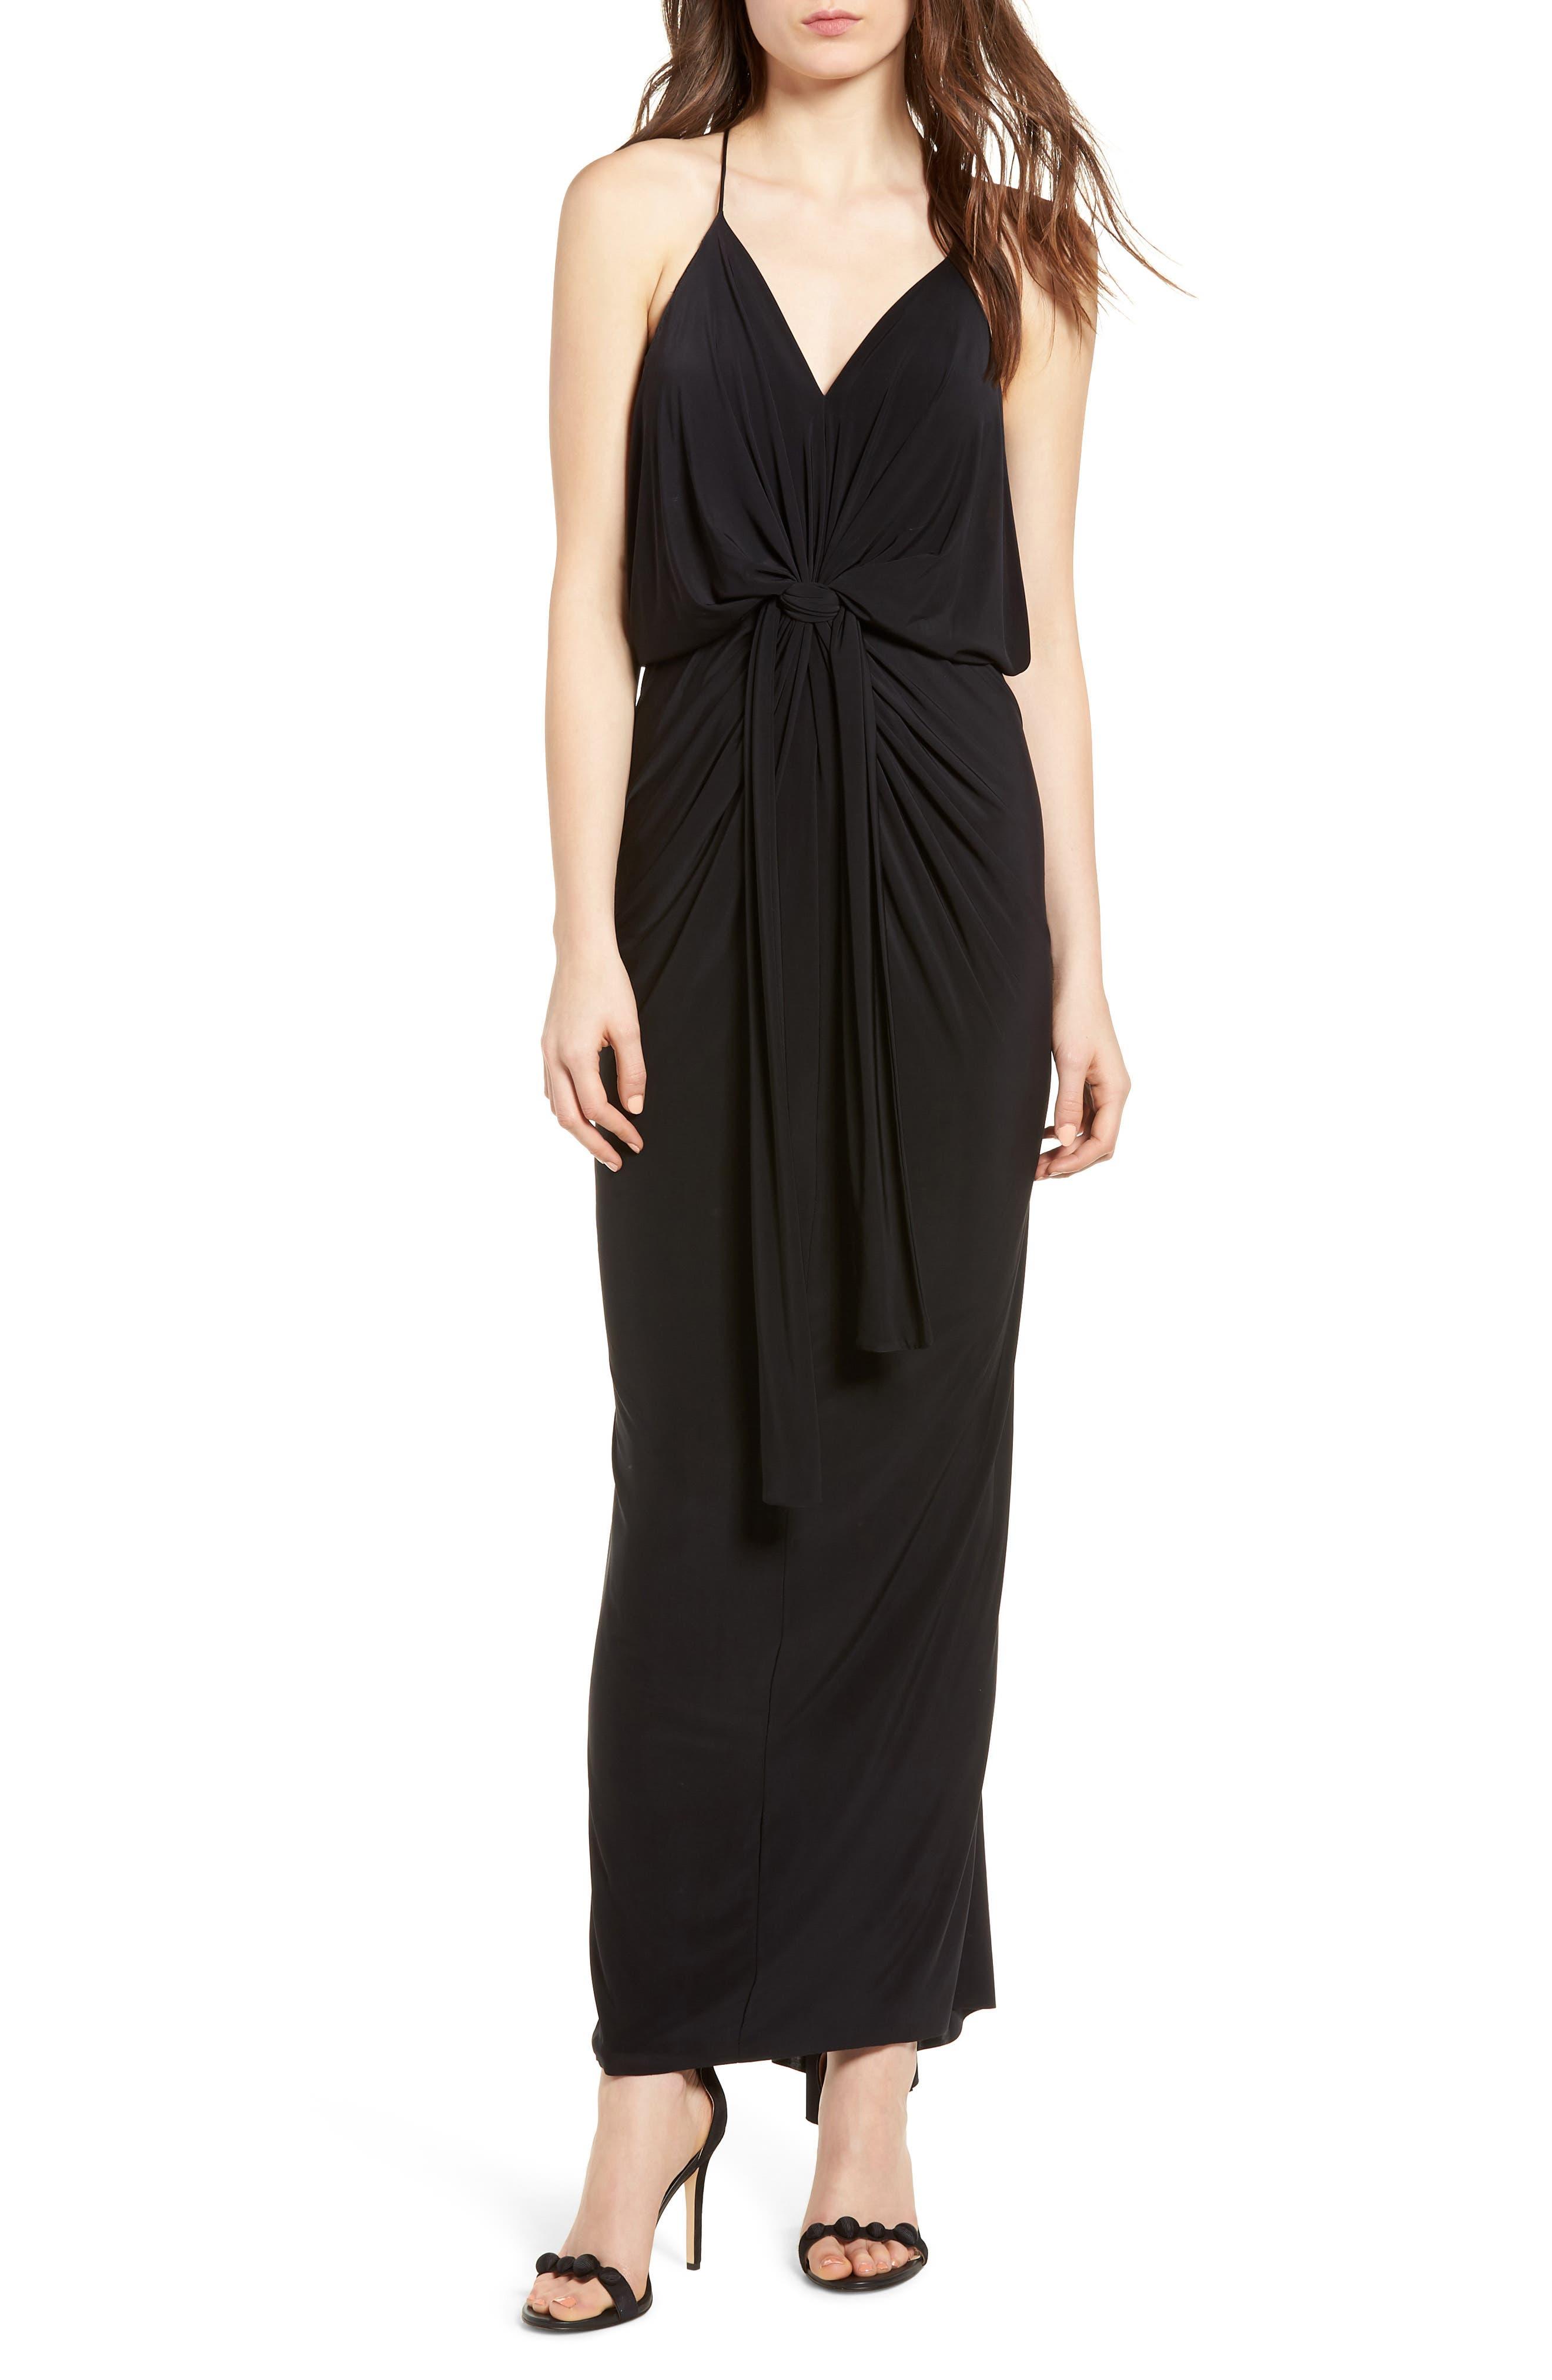 Domino Knot Maxi Dress,                             Main thumbnail 1, color,                             Black